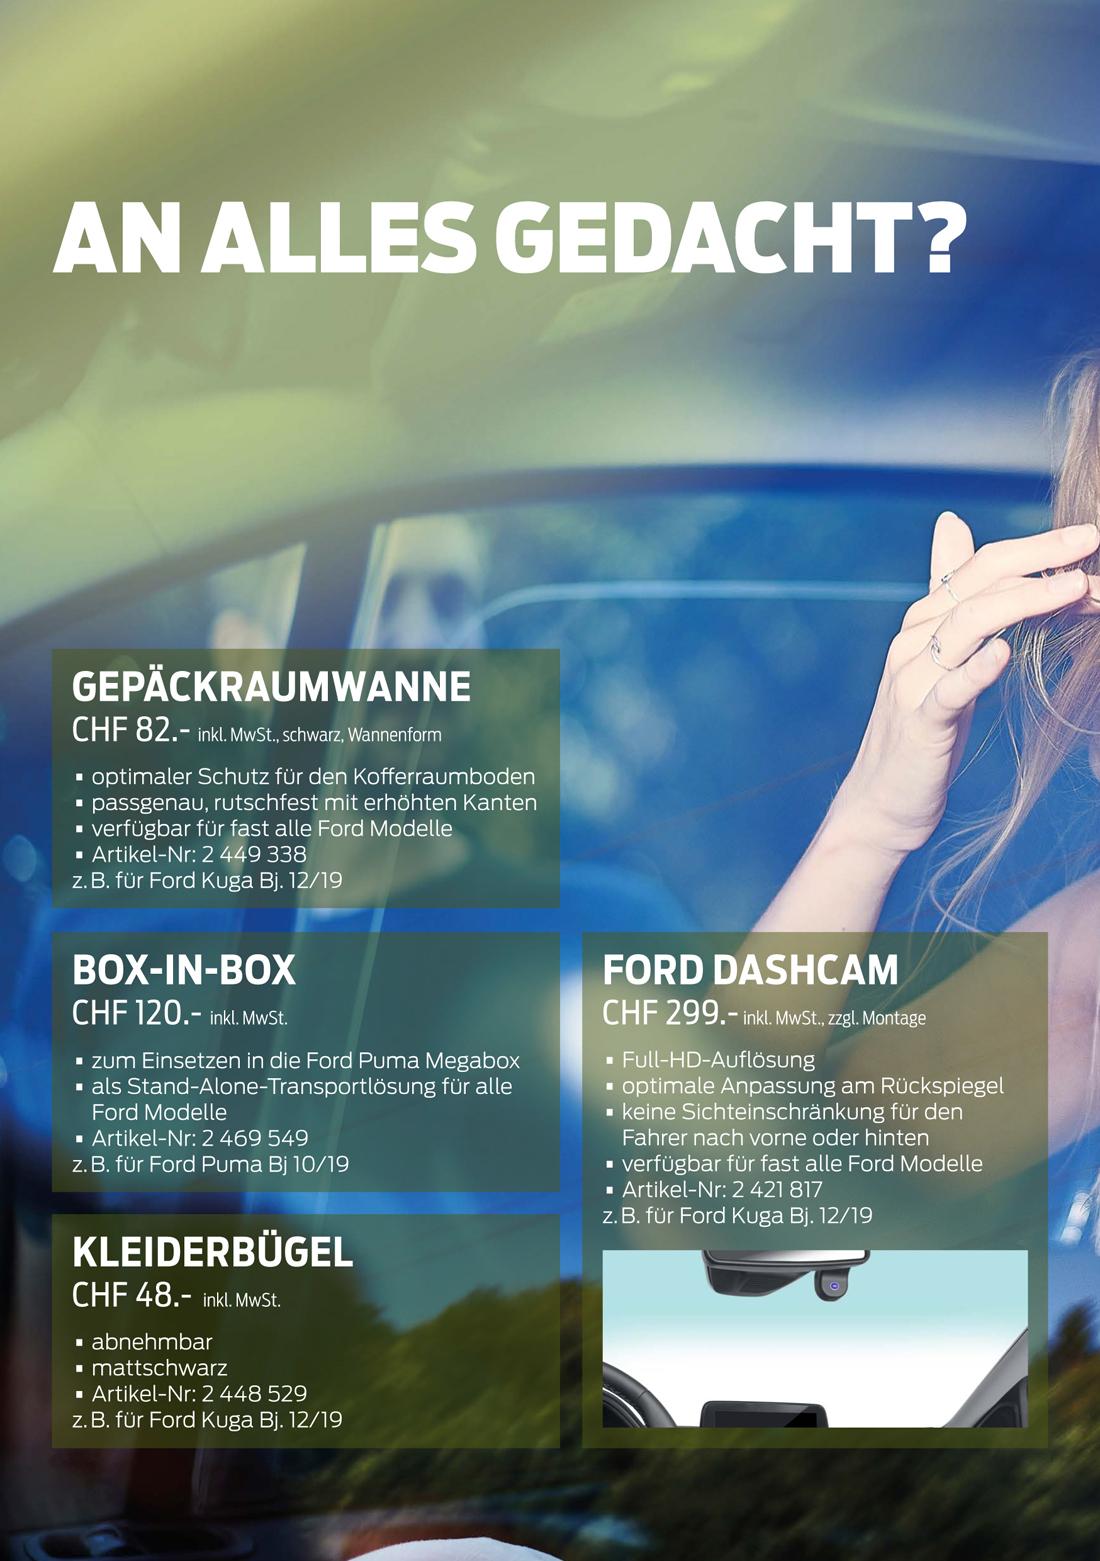 2021-Ford_Fruehlingskampagne_Broschuere-Seite-4a-2021-03-02.jpg#asset:720